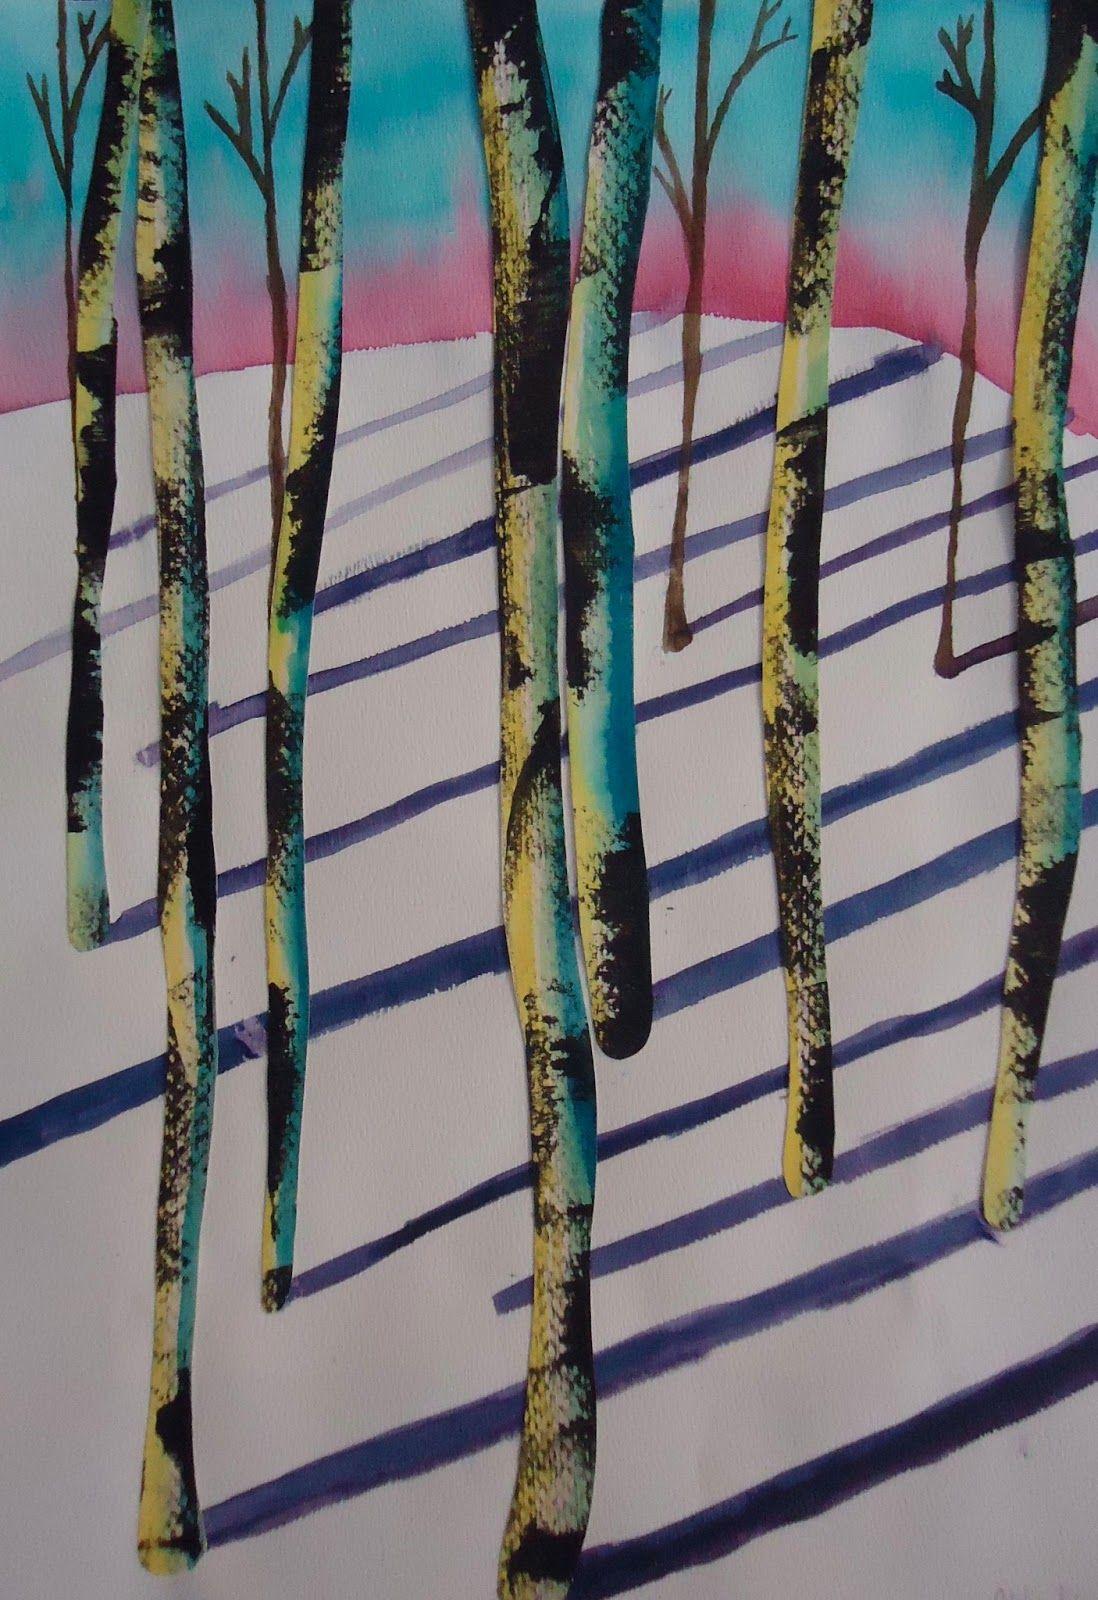 Mini Matisse Winter Wooded Watercolor